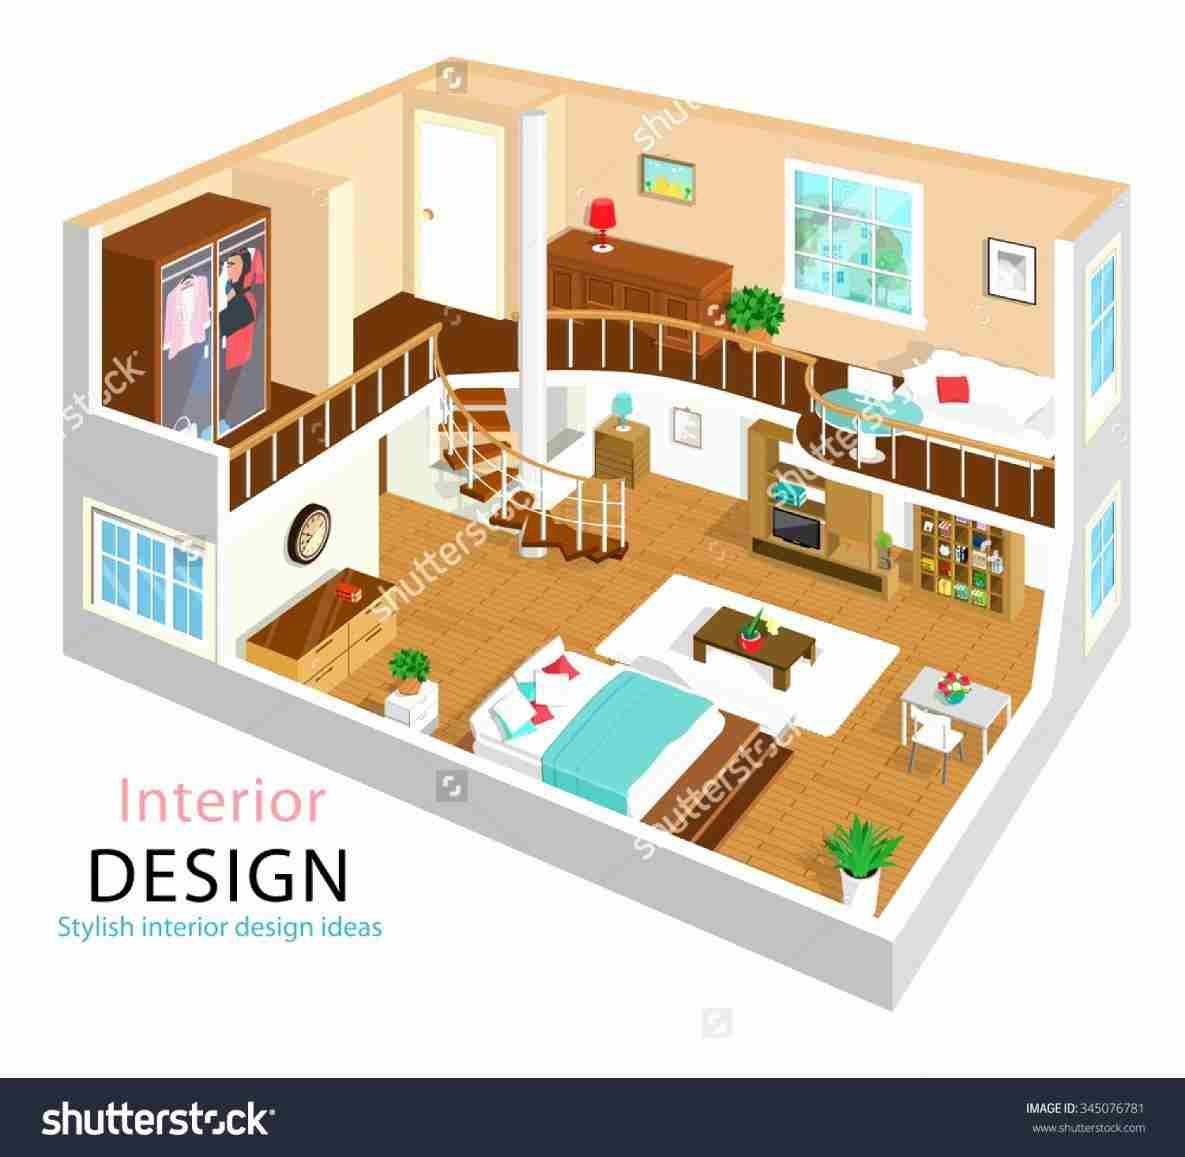 Http Mna Events Com 2 Storey House Design Plans 3d Html